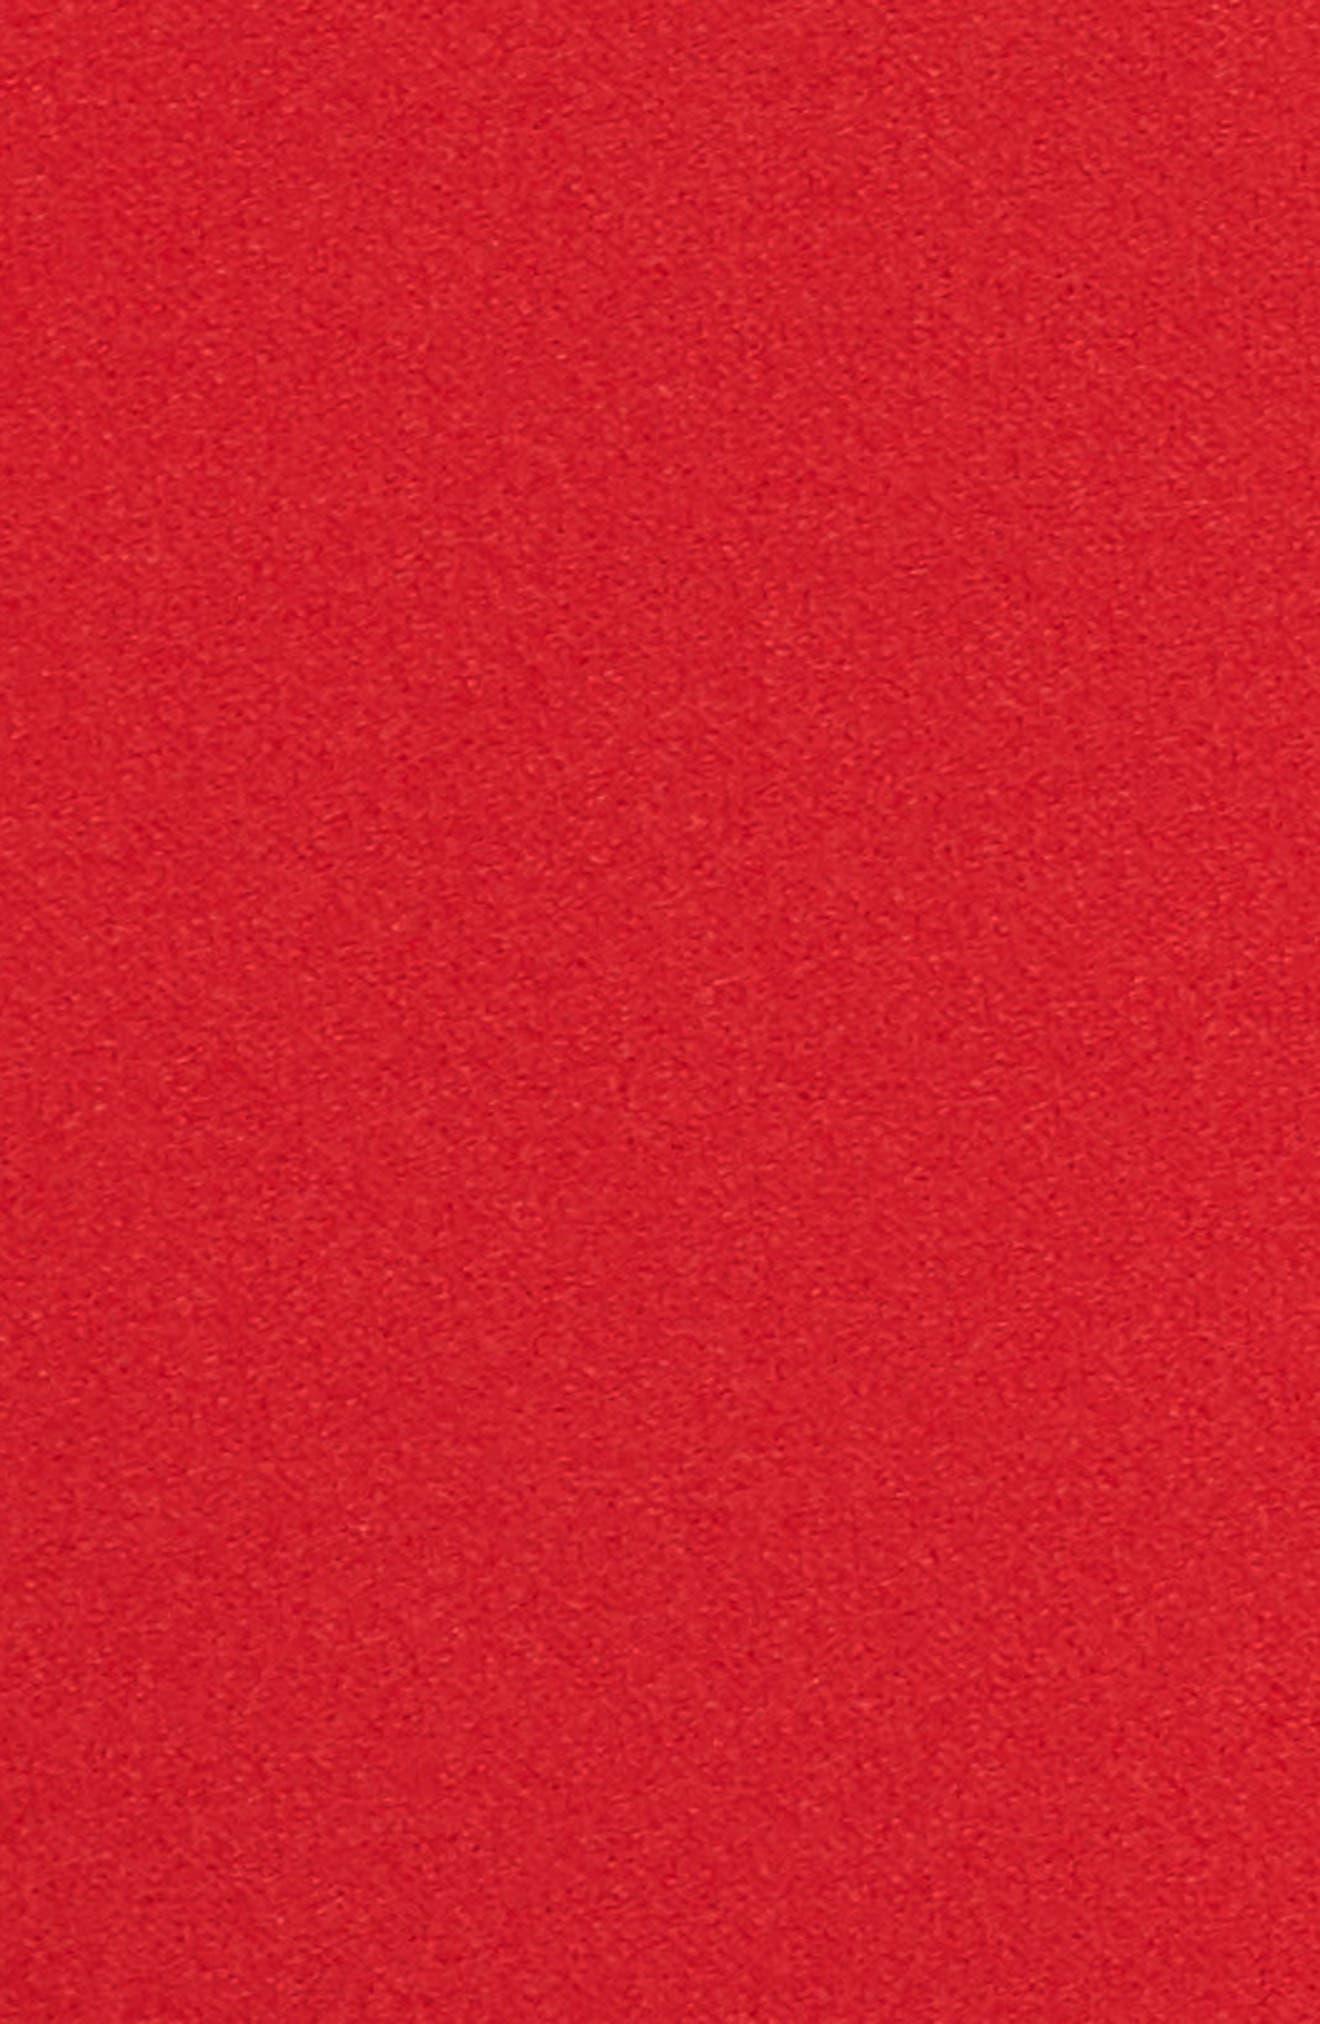 Strapless Culotte Jumpsuit,                             Alternate thumbnail 6, color,                             Red